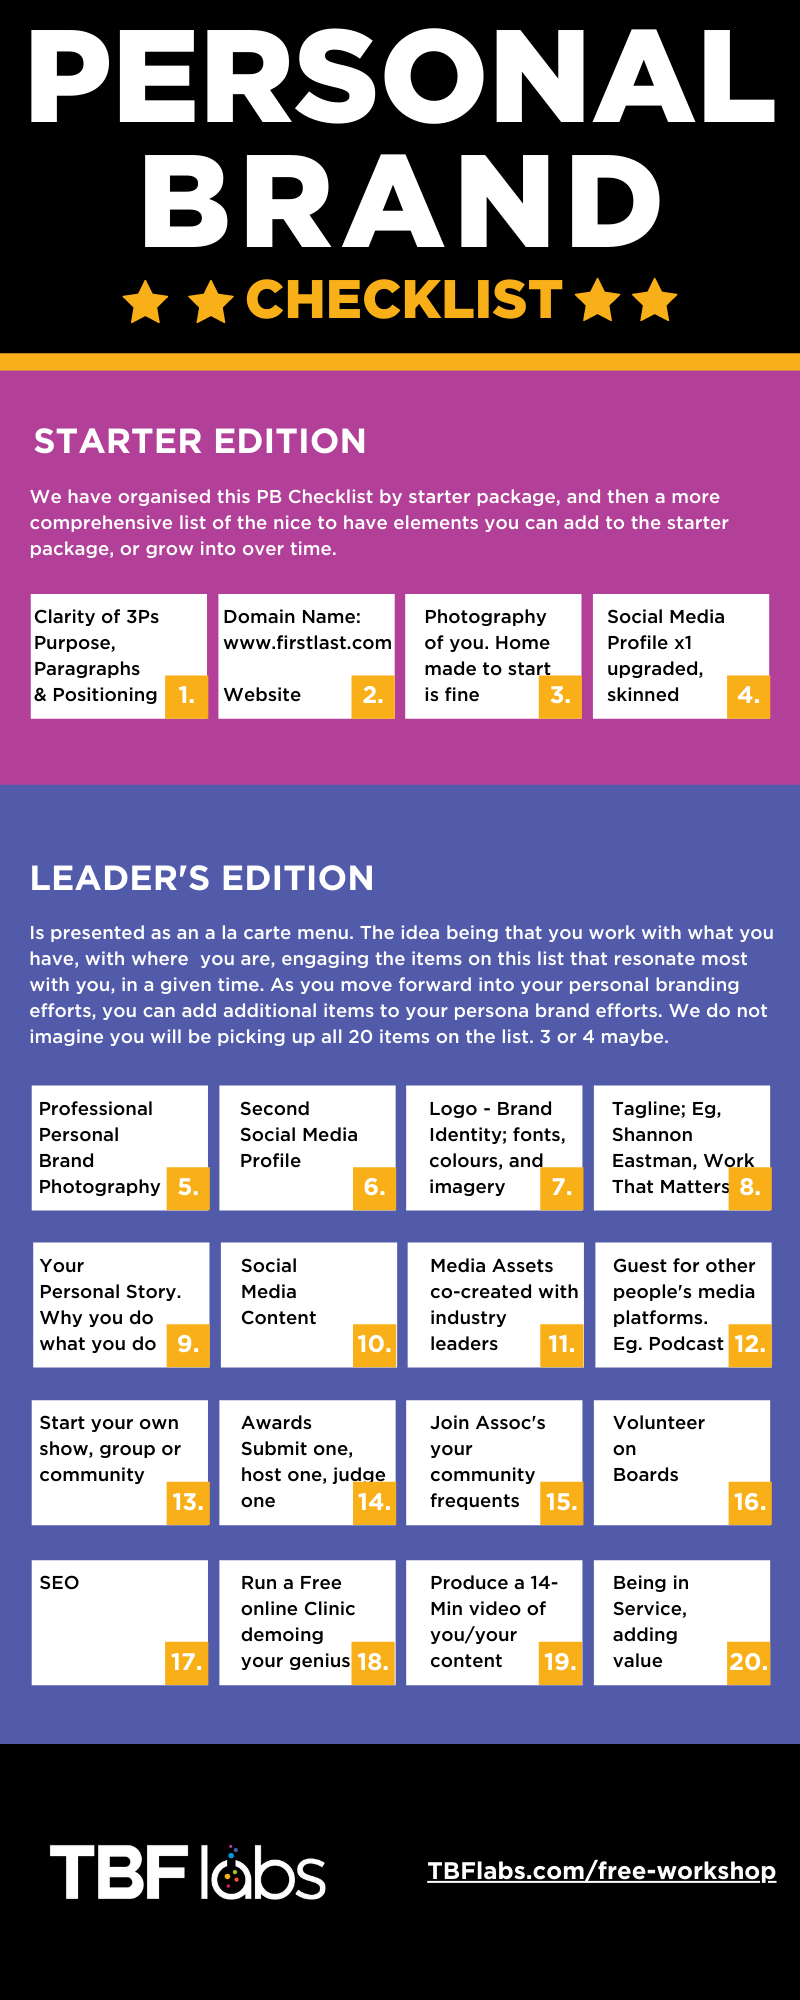 A Personal Brand Checklist